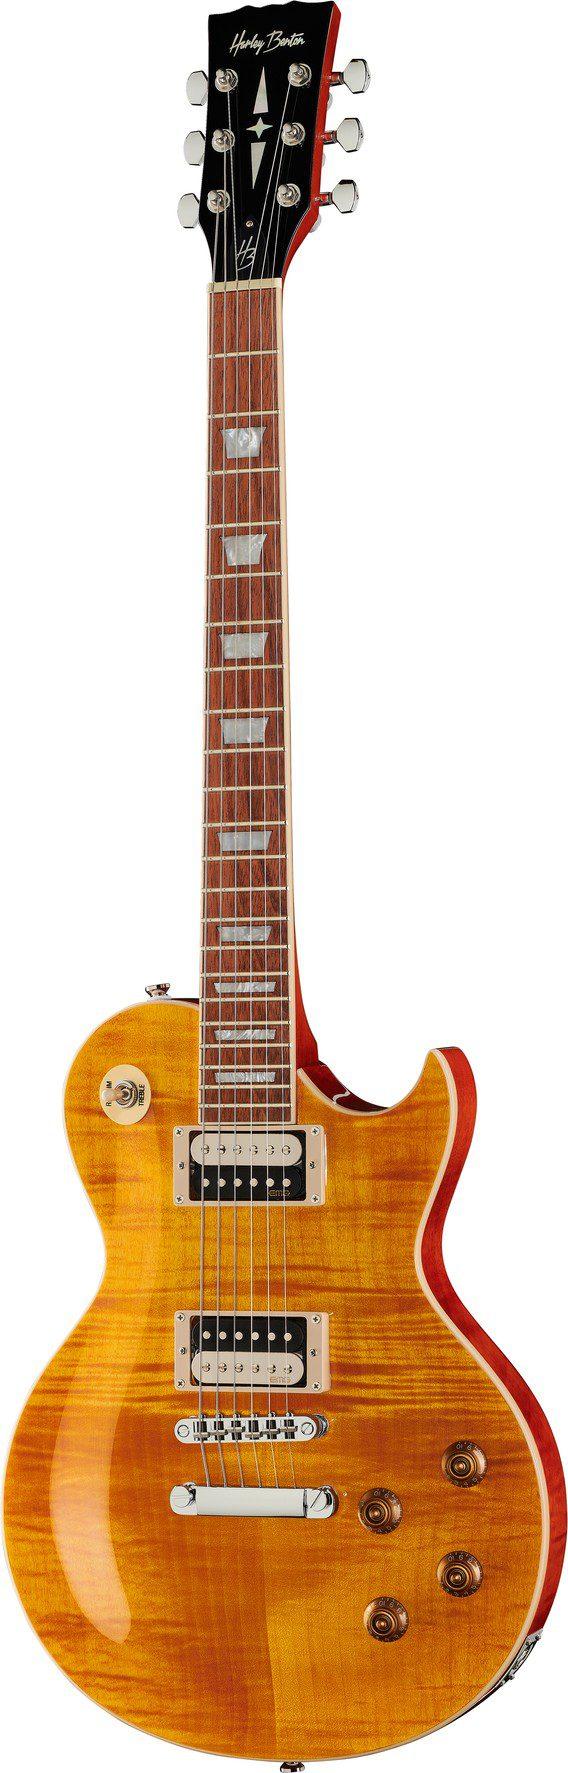 Harley Benton SC-550 Plus 1